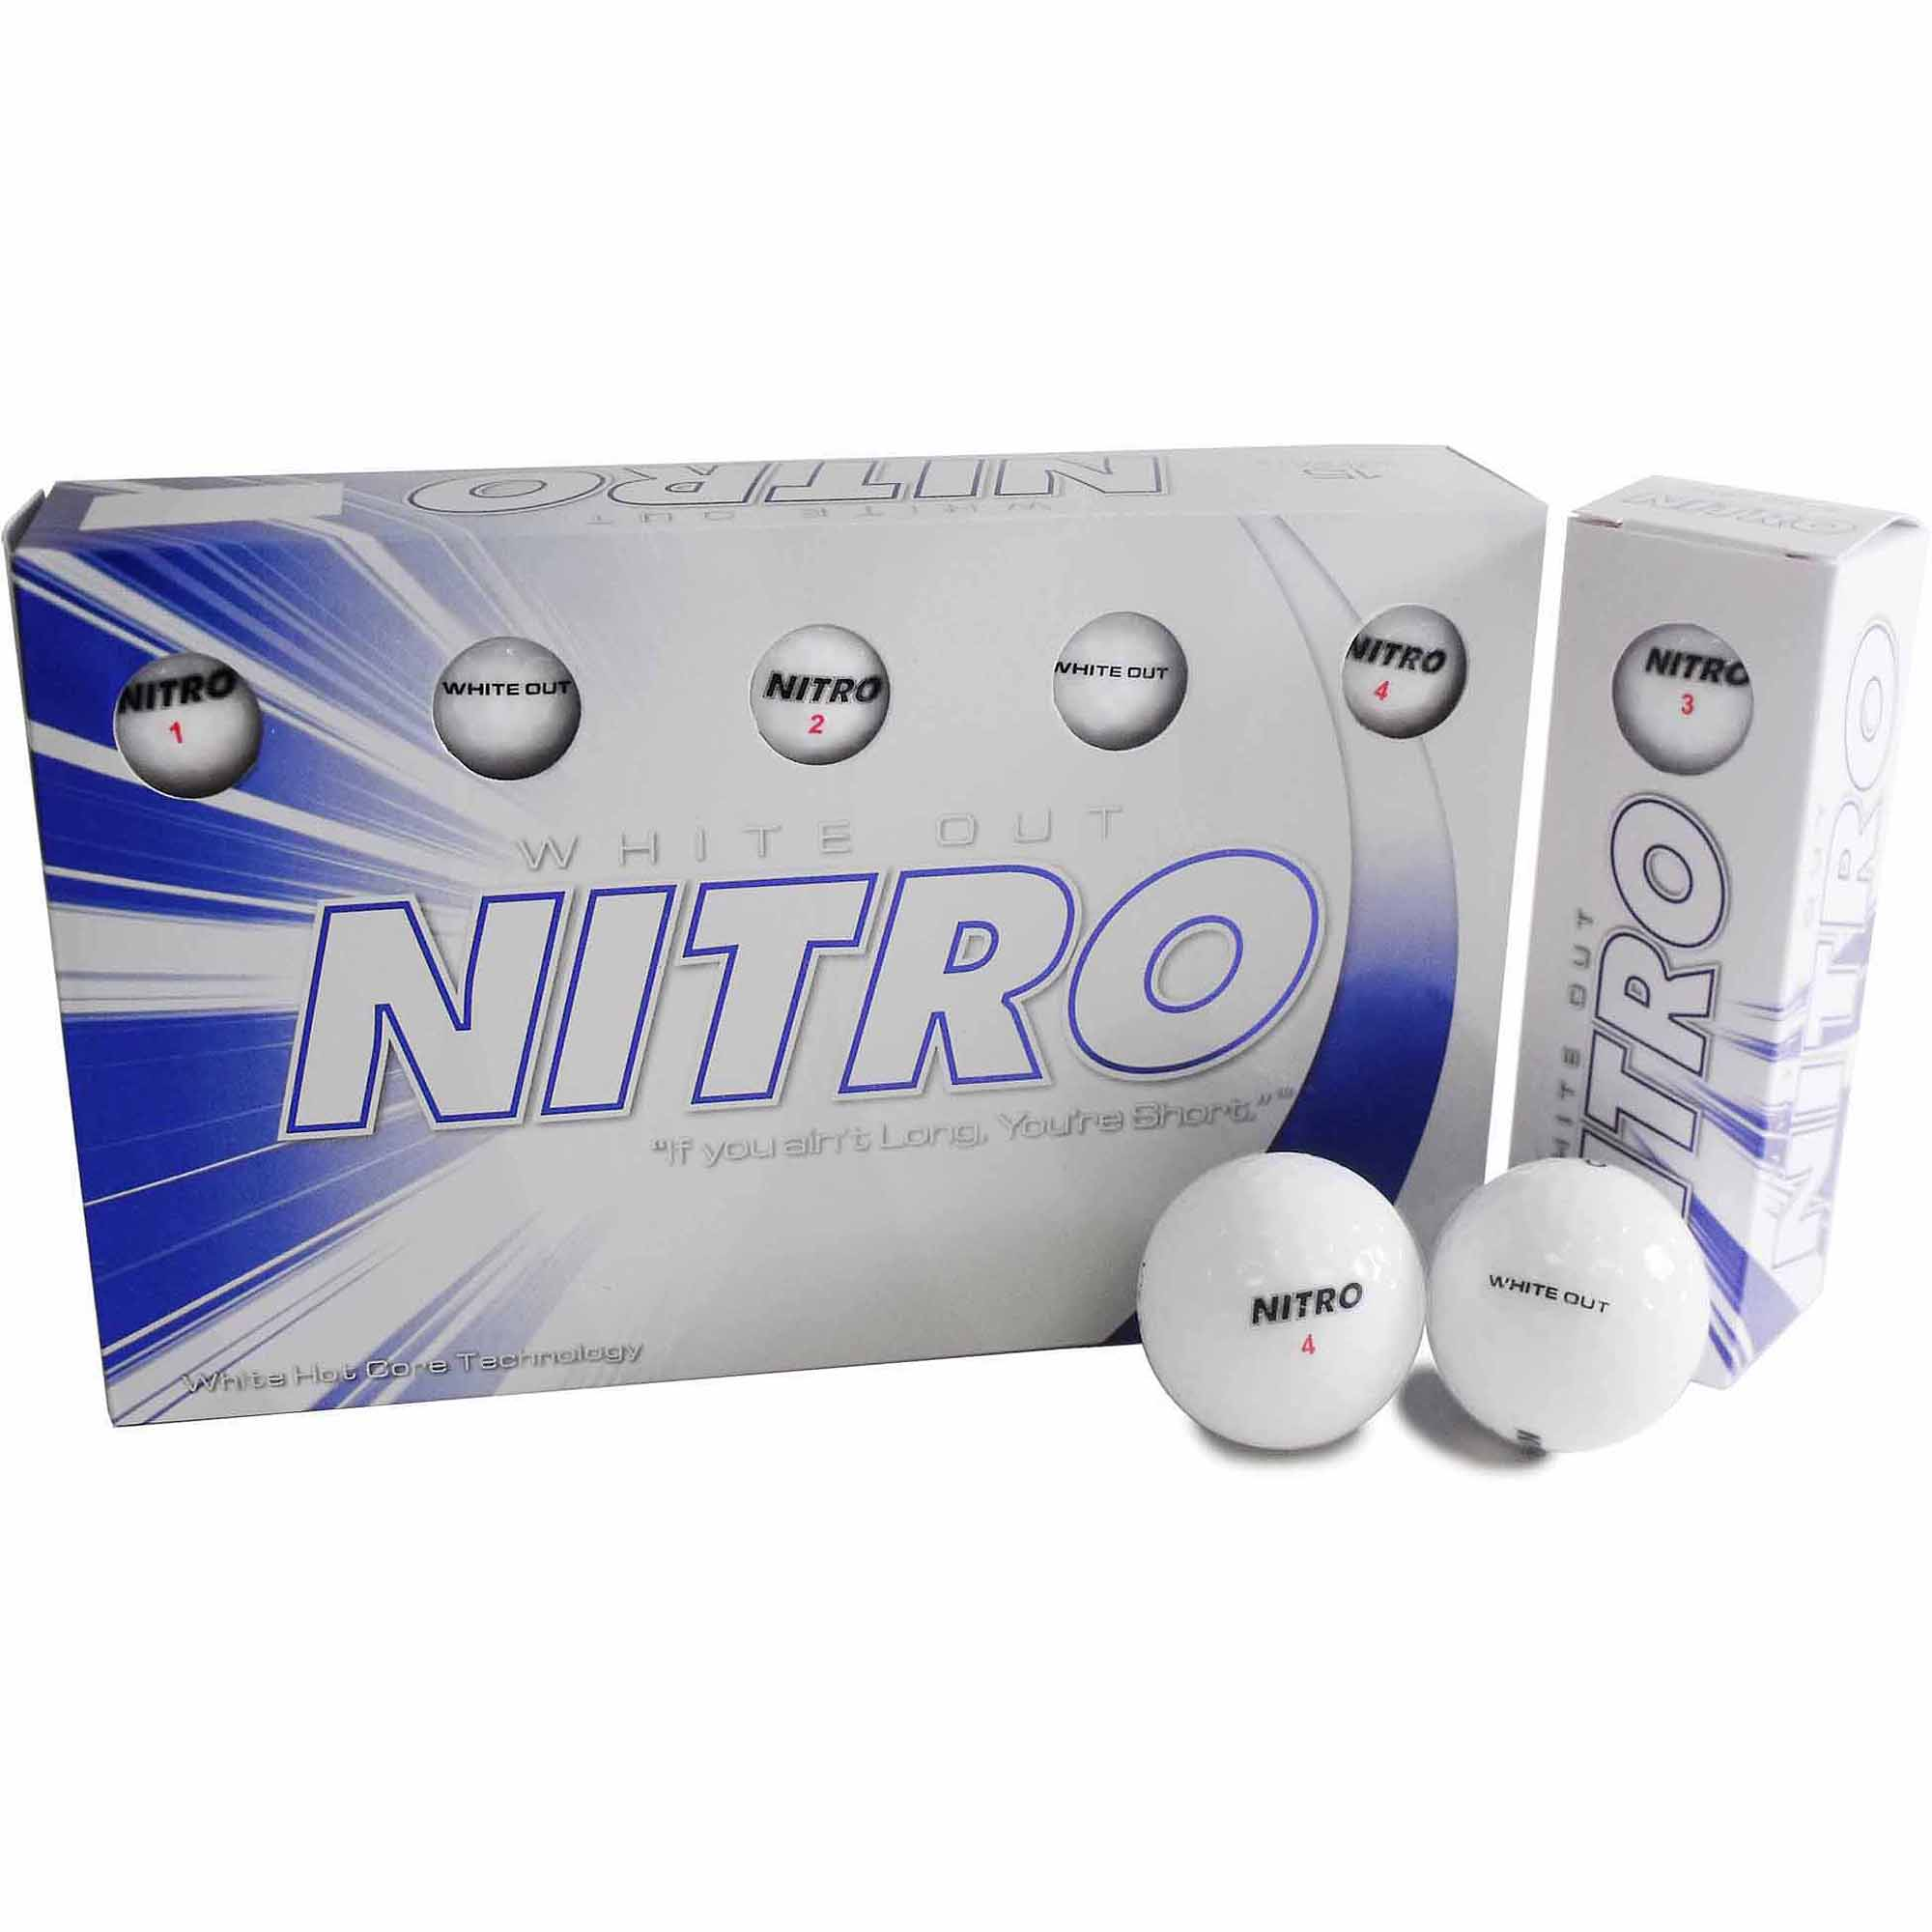 Nitro White Out Goft Ball, 15-Pack, White